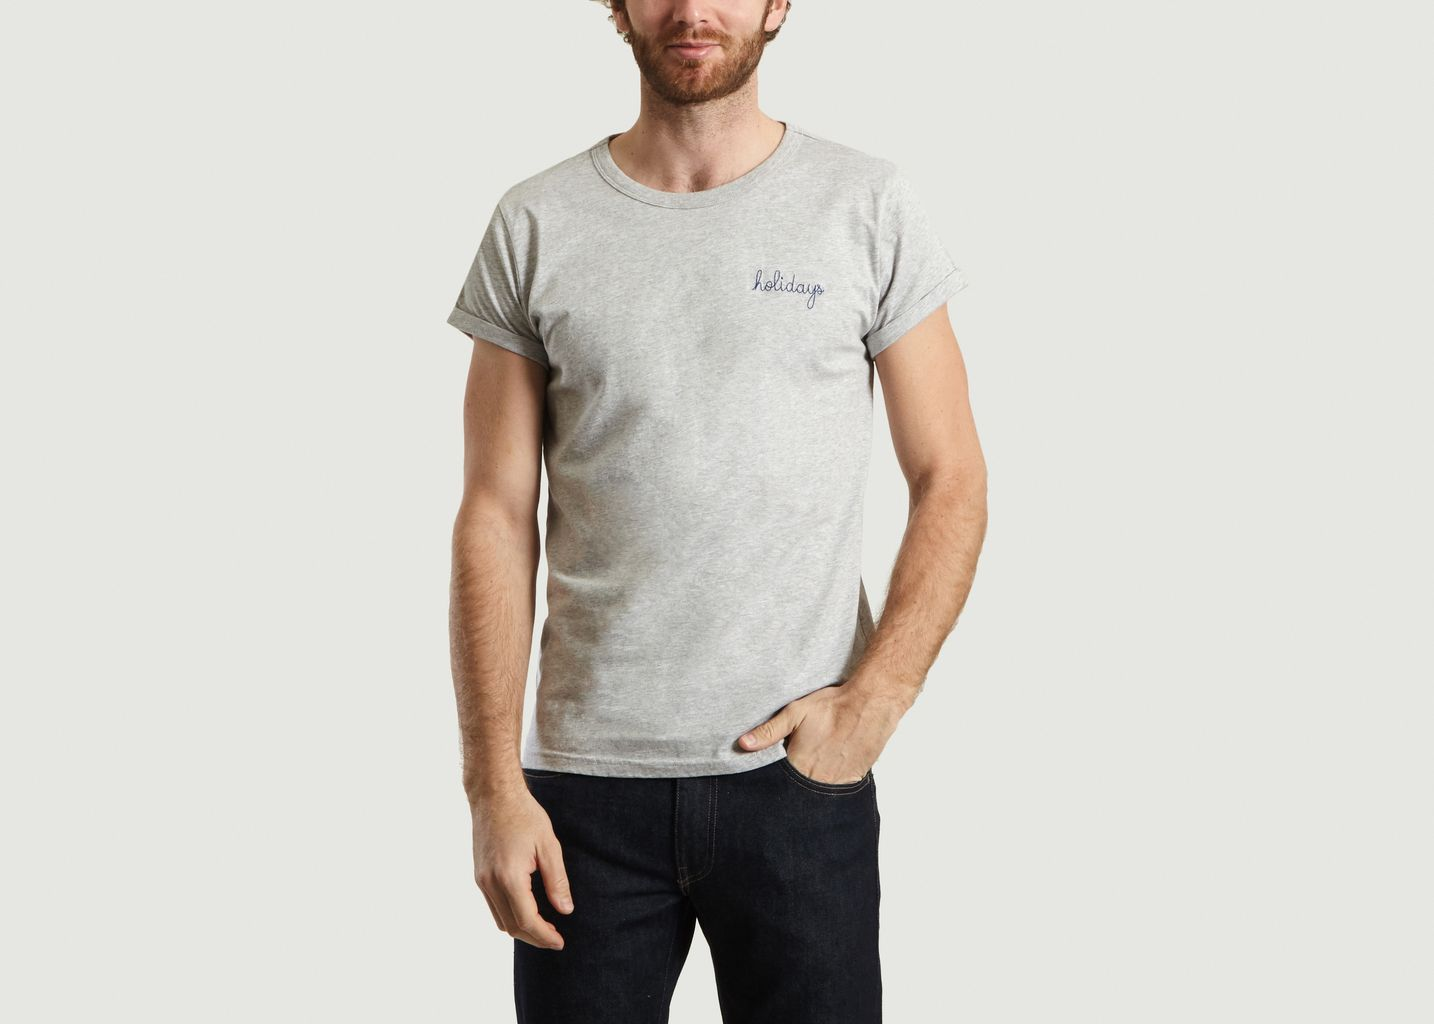 T-Shirt Brodé Holidays - Maison Labiche